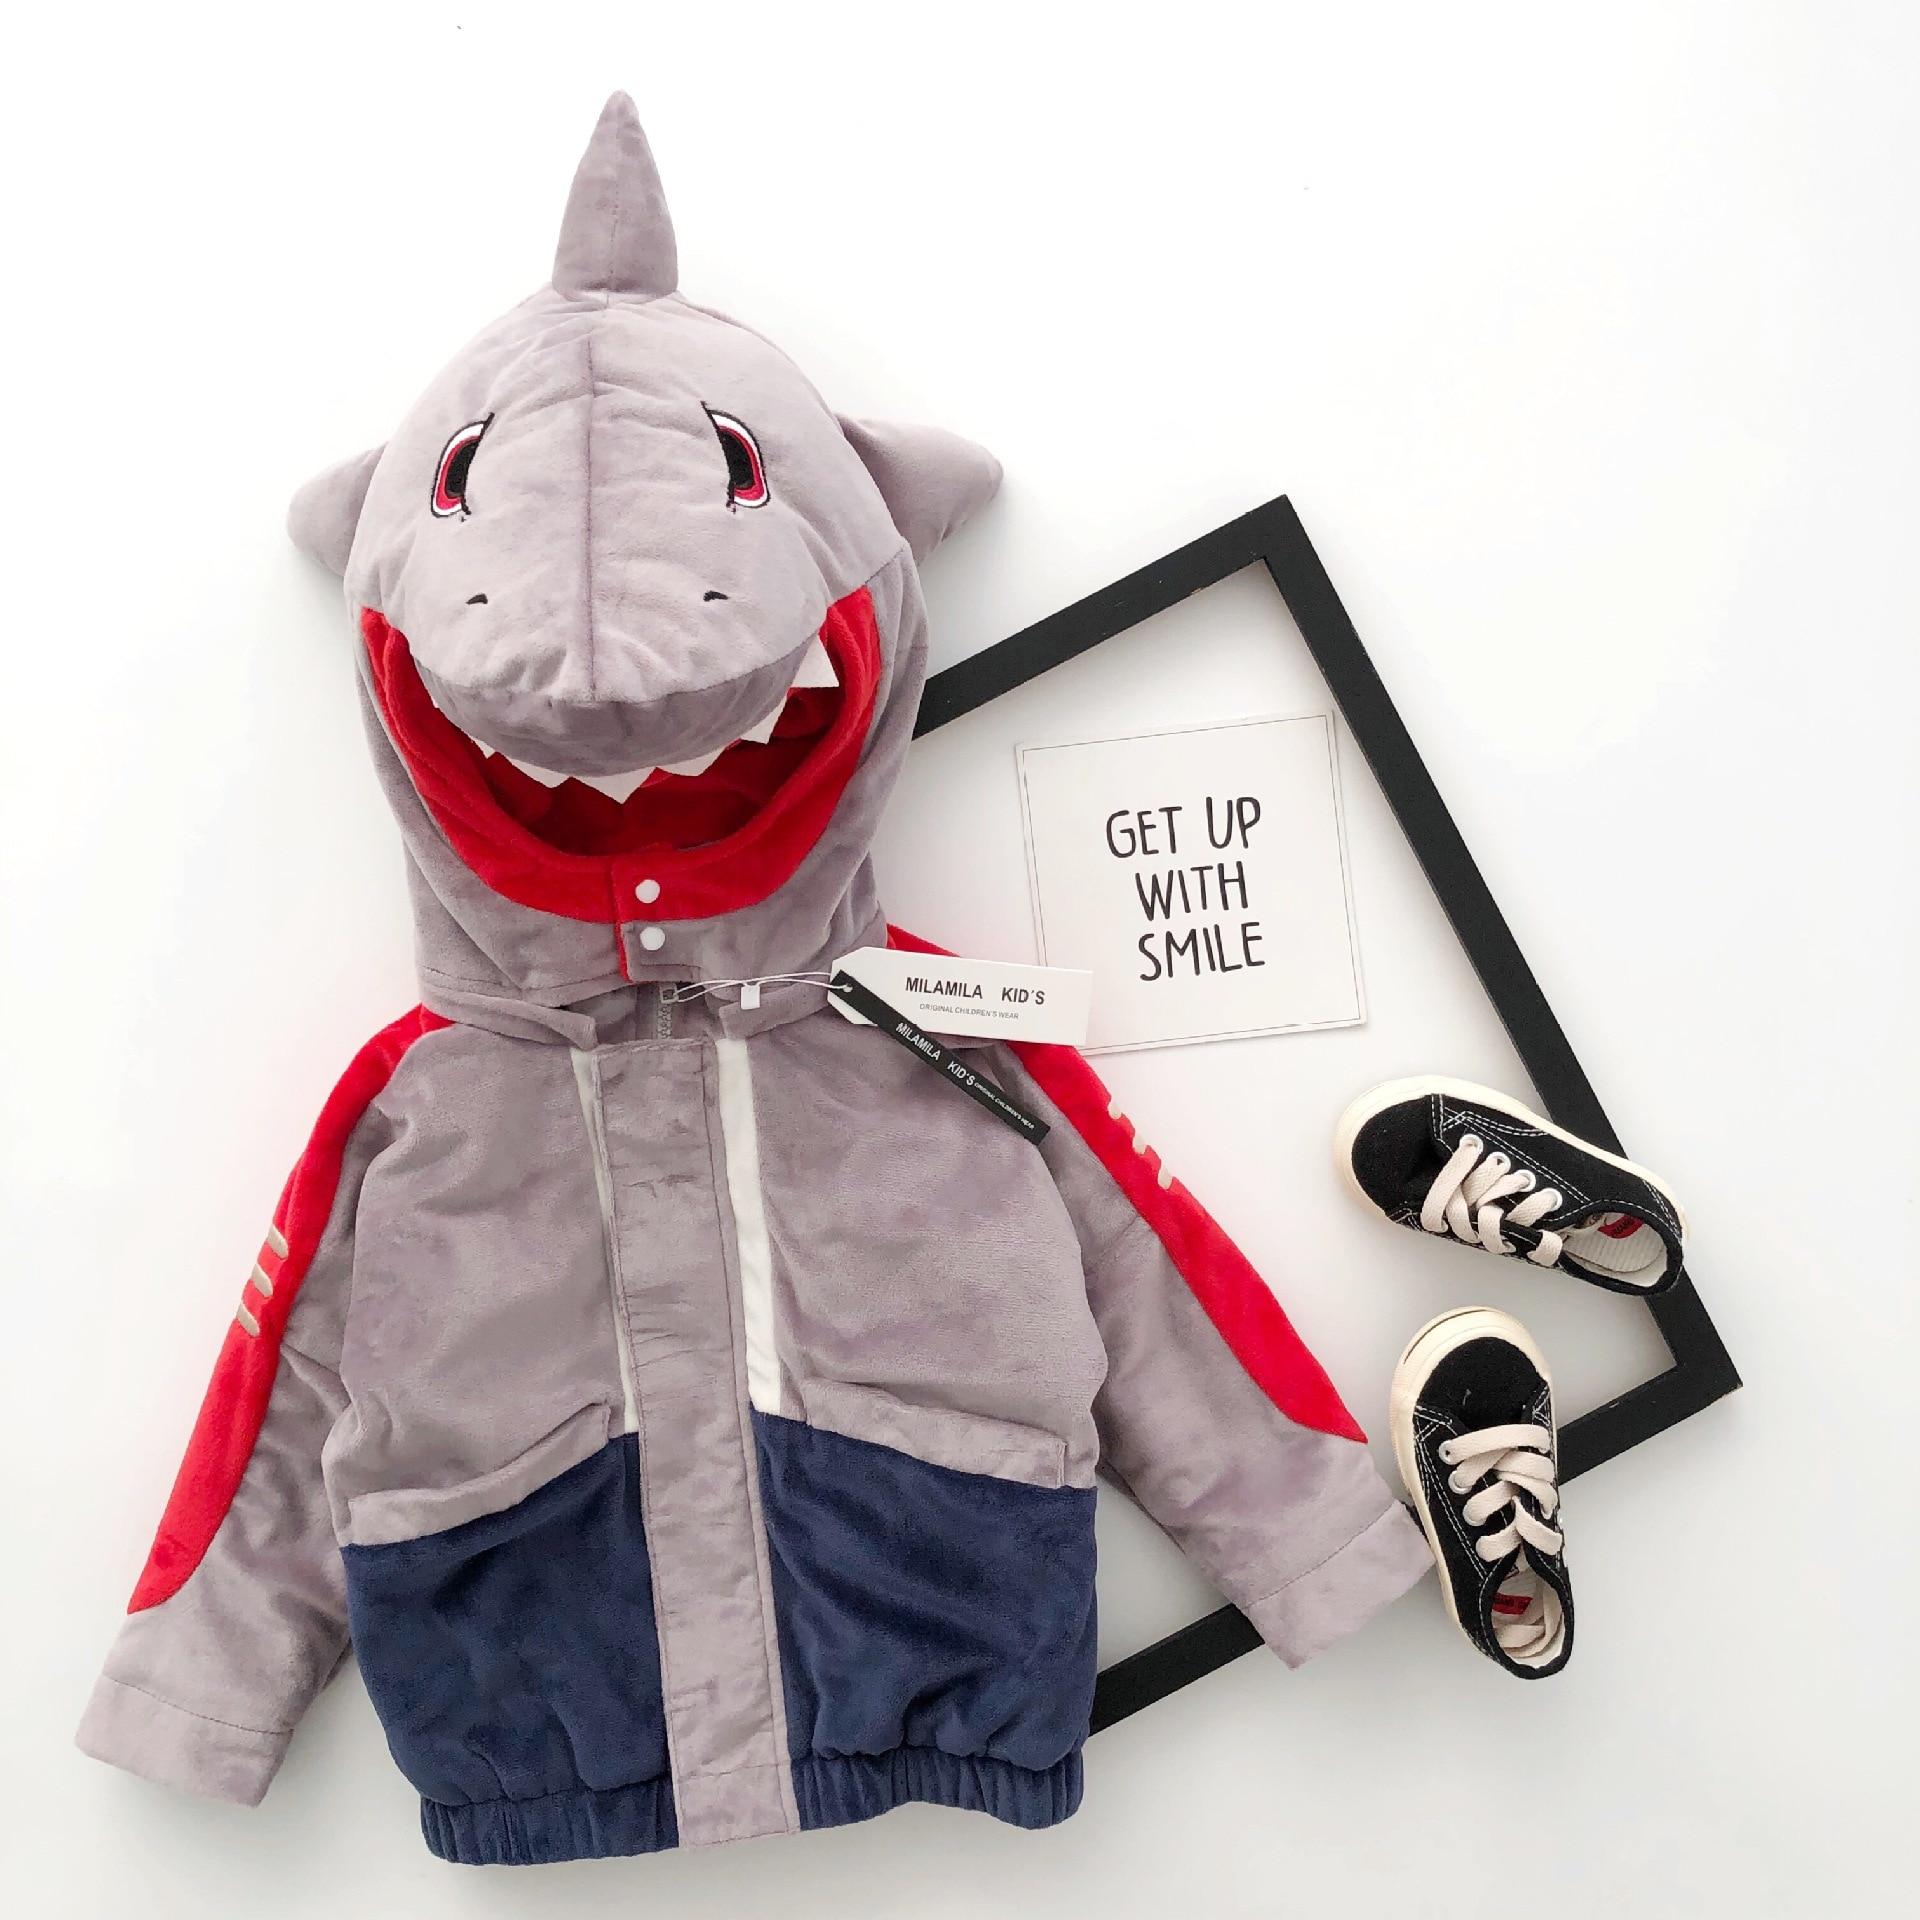 Kids, Jacket, Coats, Boys, Tonytaobaby, Three-dimensional